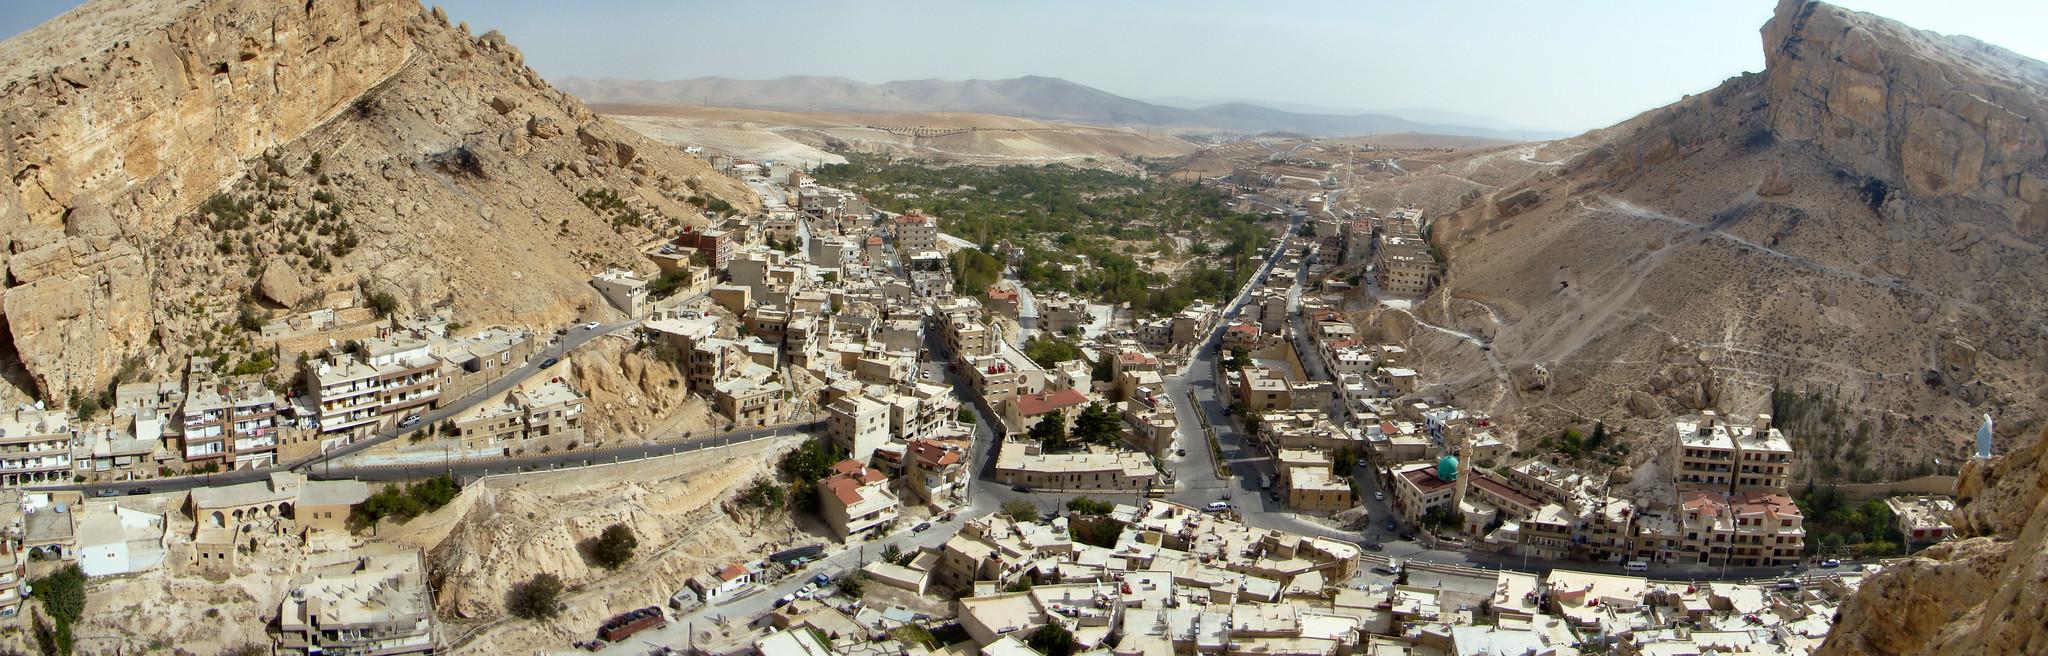 vista panoramica Maalula Siria